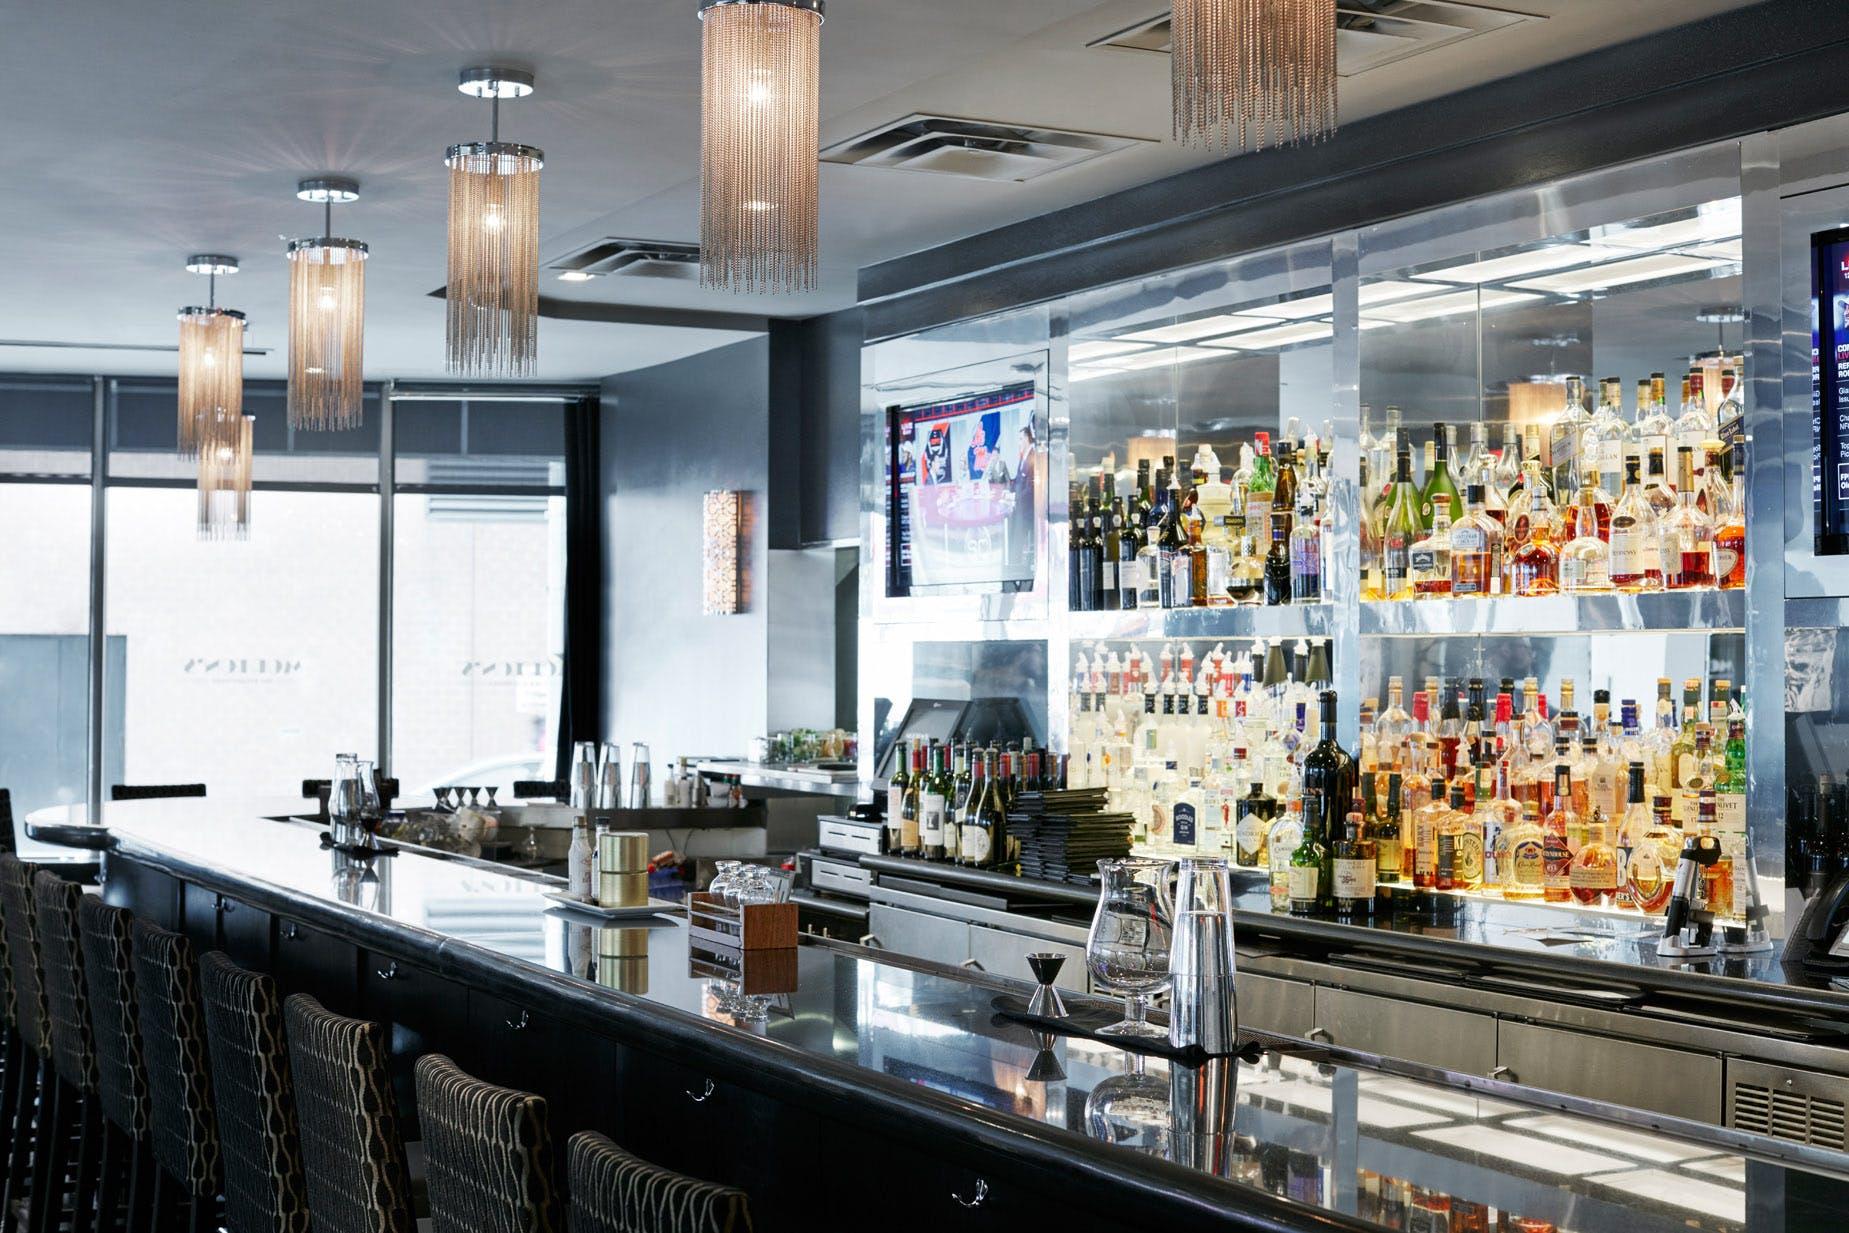 Morton's The Steakhouse adjacent to Club Quarters Hotel, World Trade Center